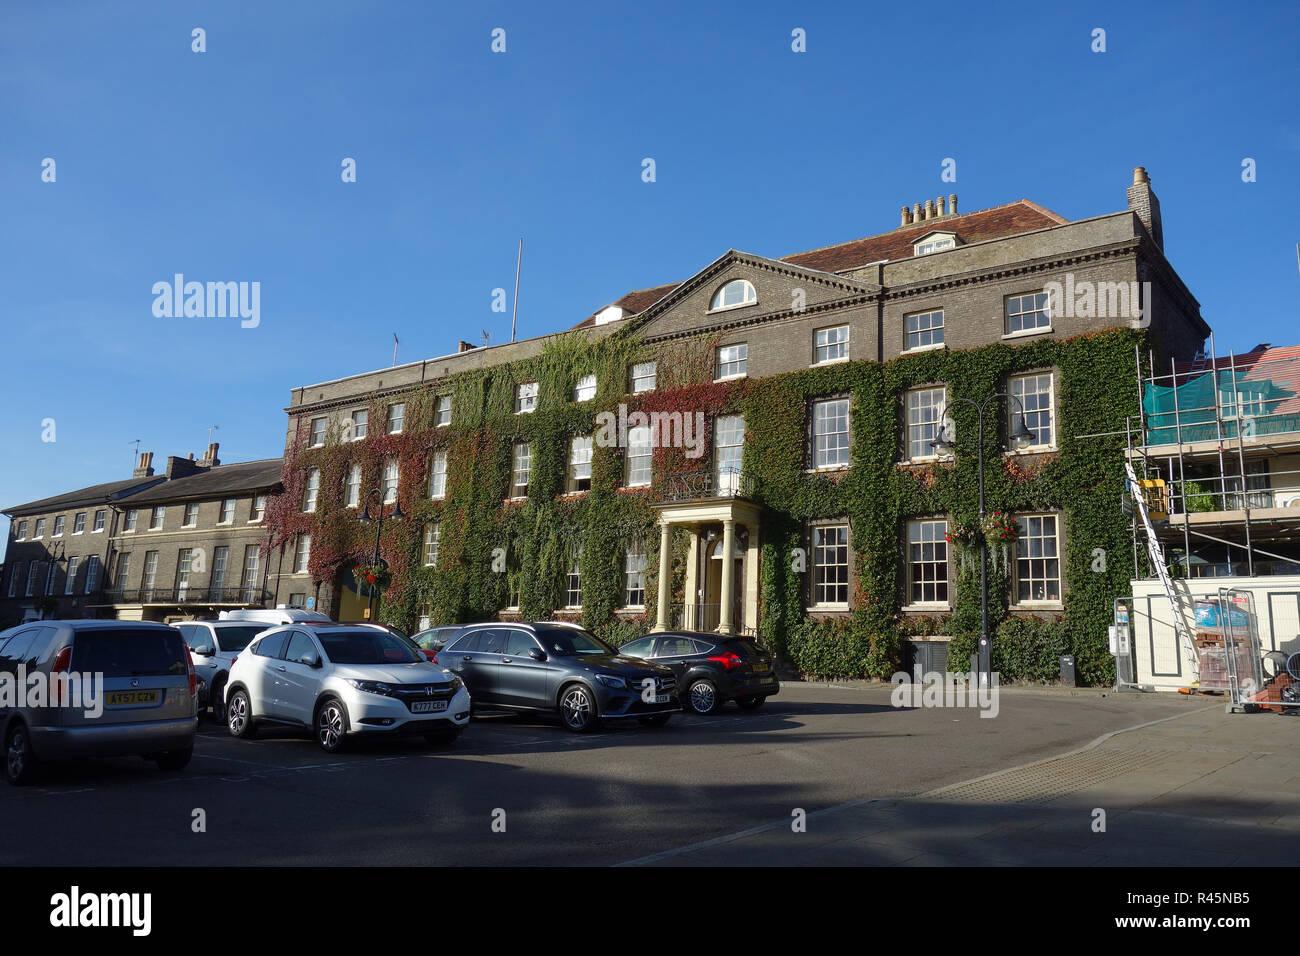 The Angel Hotel, Bury St Edmunds, Suffolk - Stock Image